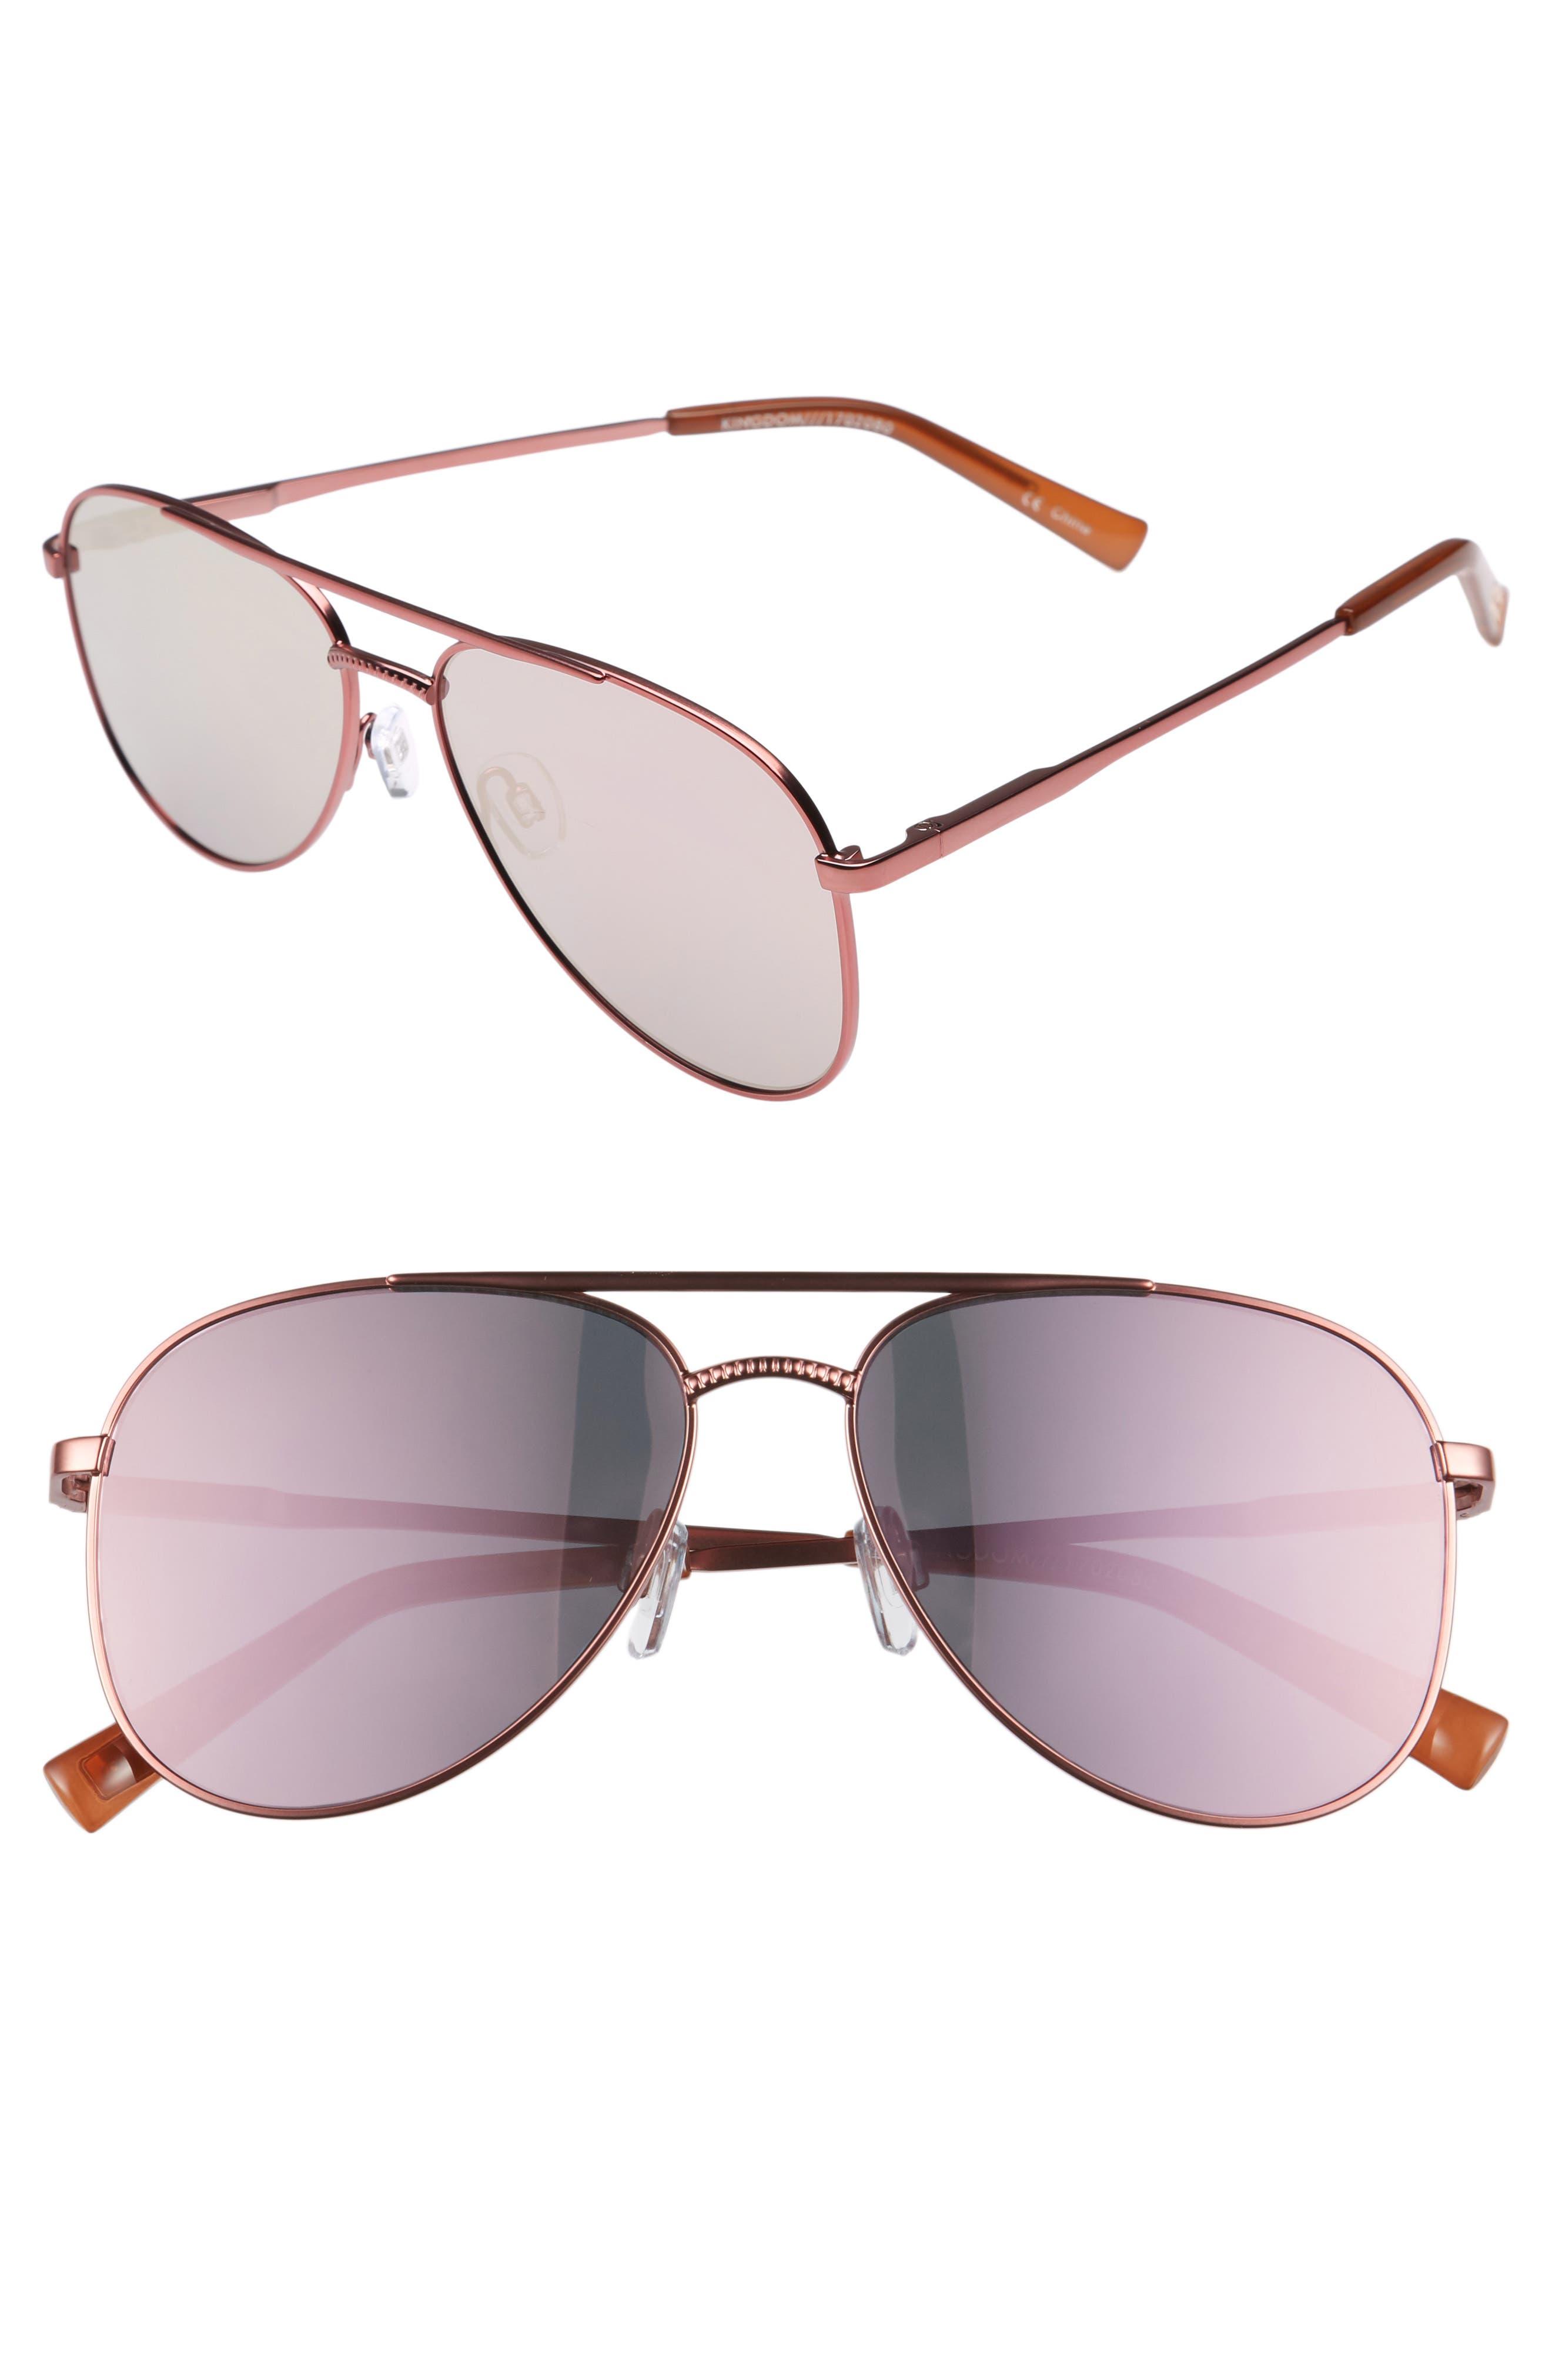 Le Specs Kingdom 57mm Polarized Aviator Sunglasses